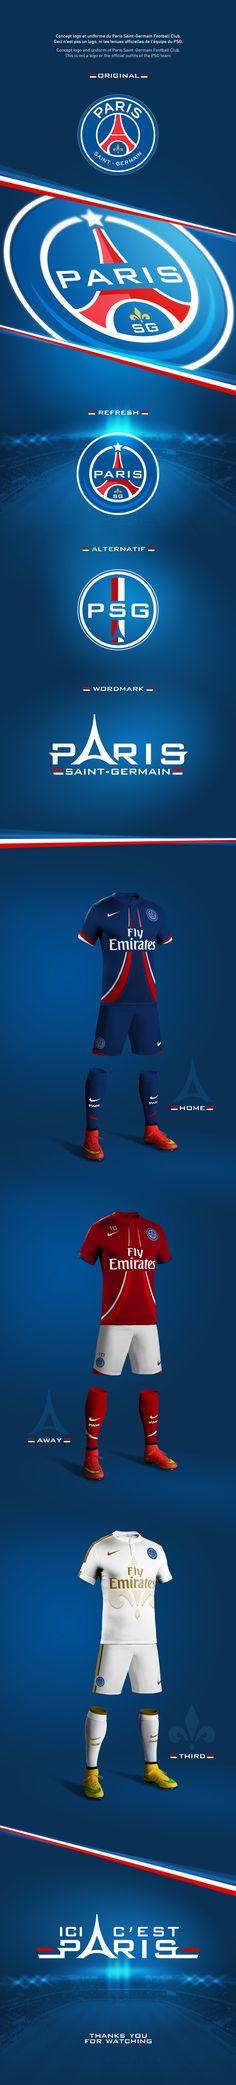 Concept rebrand PSG football club on Behance